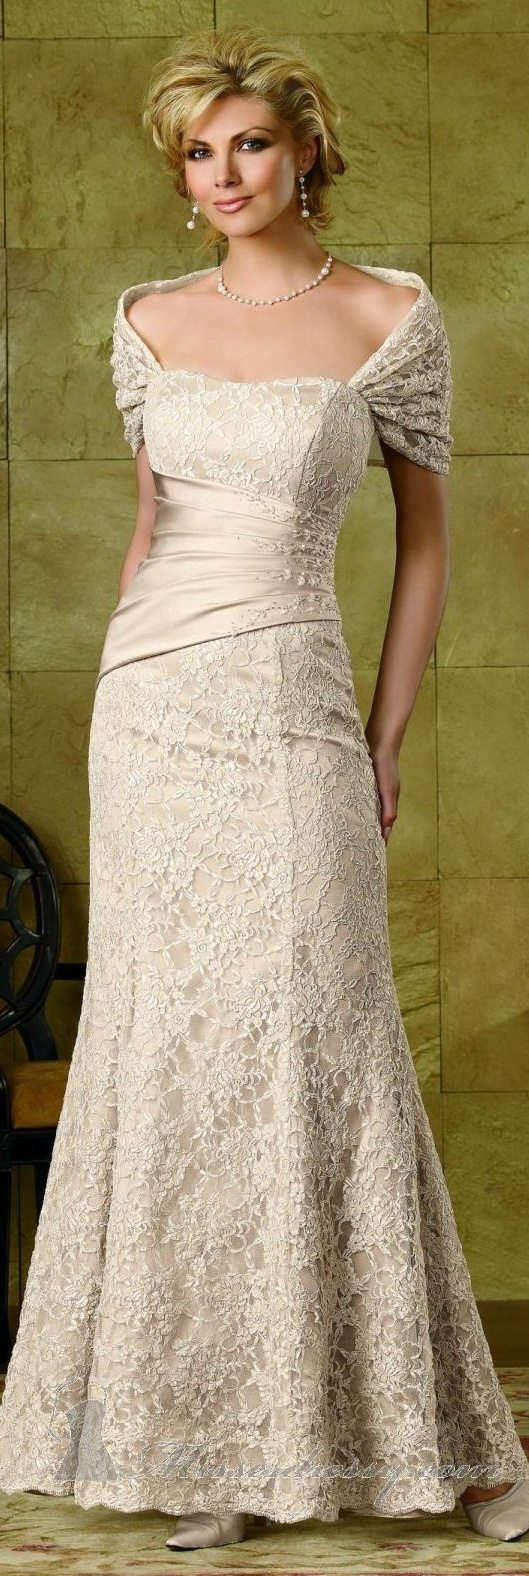 older brides wedding dresses photo - 1